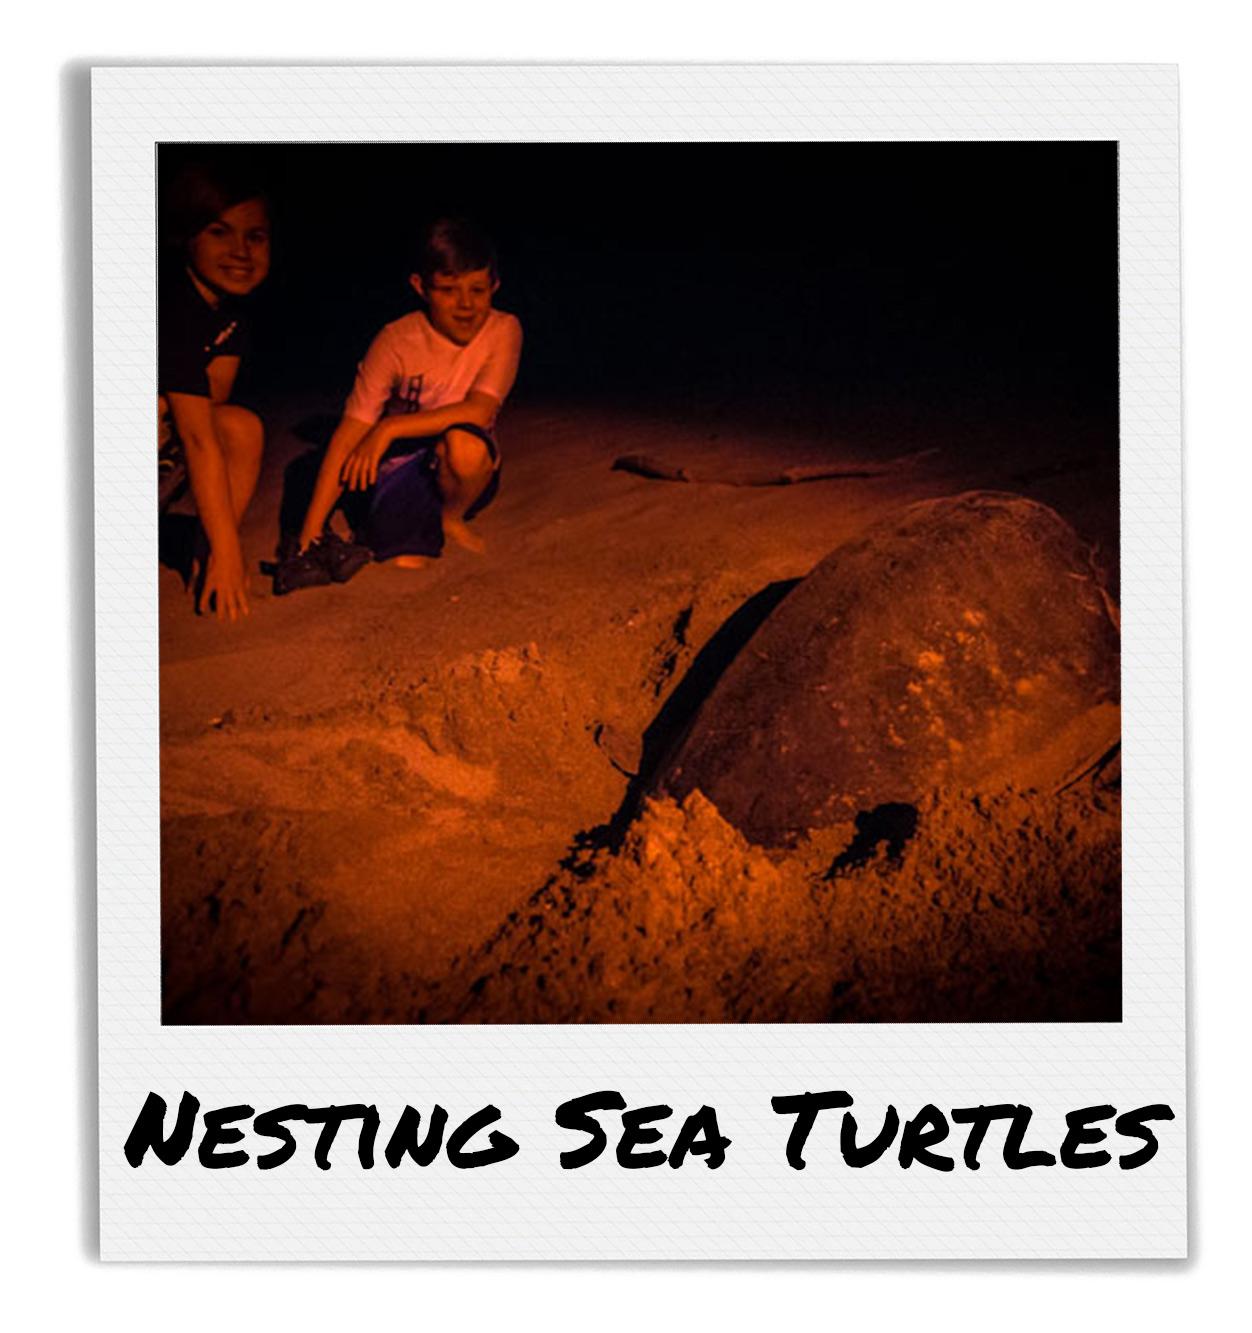 Turtle Nesting Tours at Playa La Flor, Nicaragua